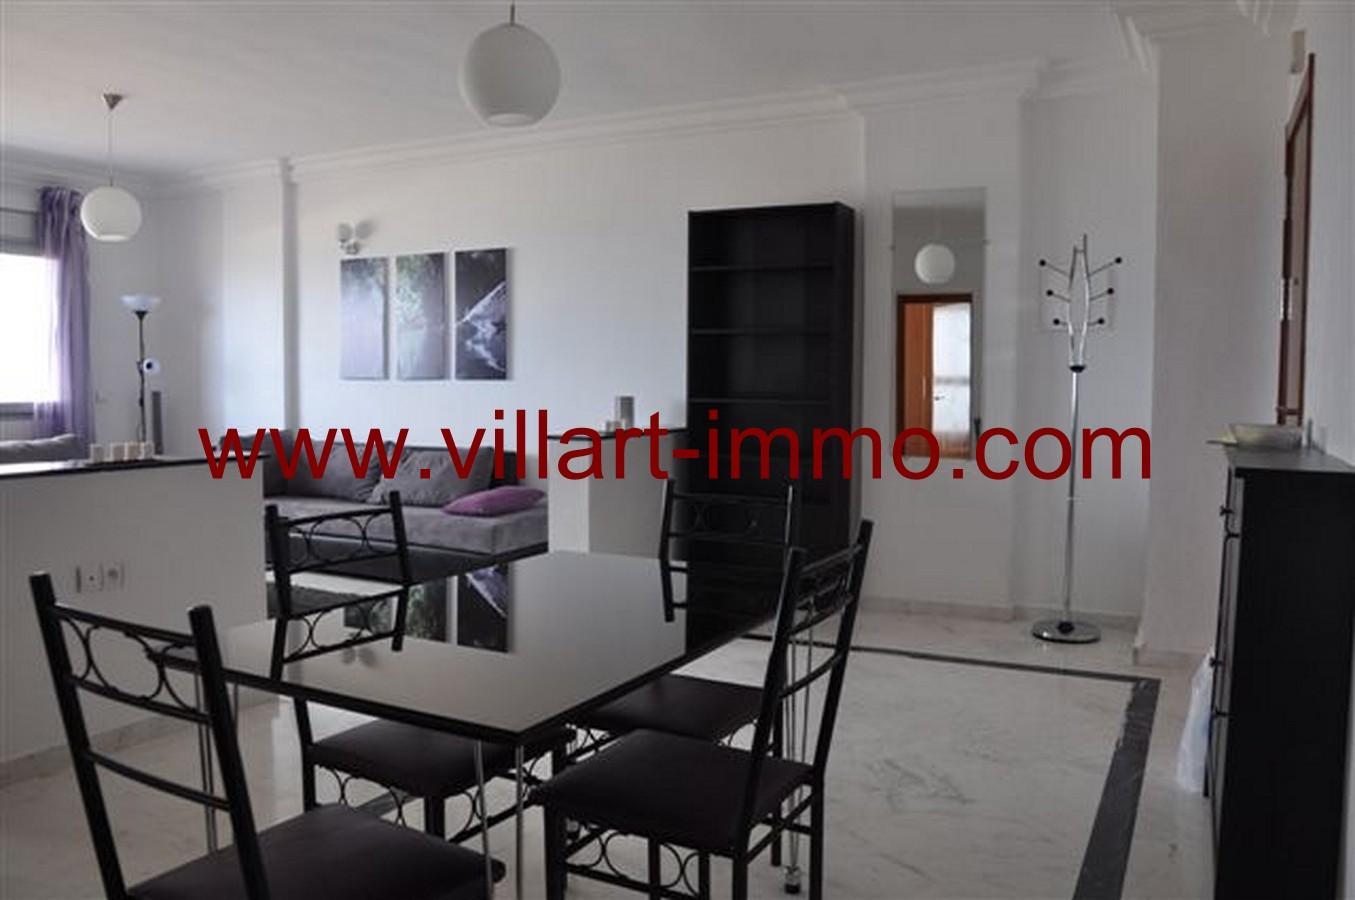 3-Location-Appartement-Meublé-Tanger-Centre ville-Salle à manger-L131-Villart immo